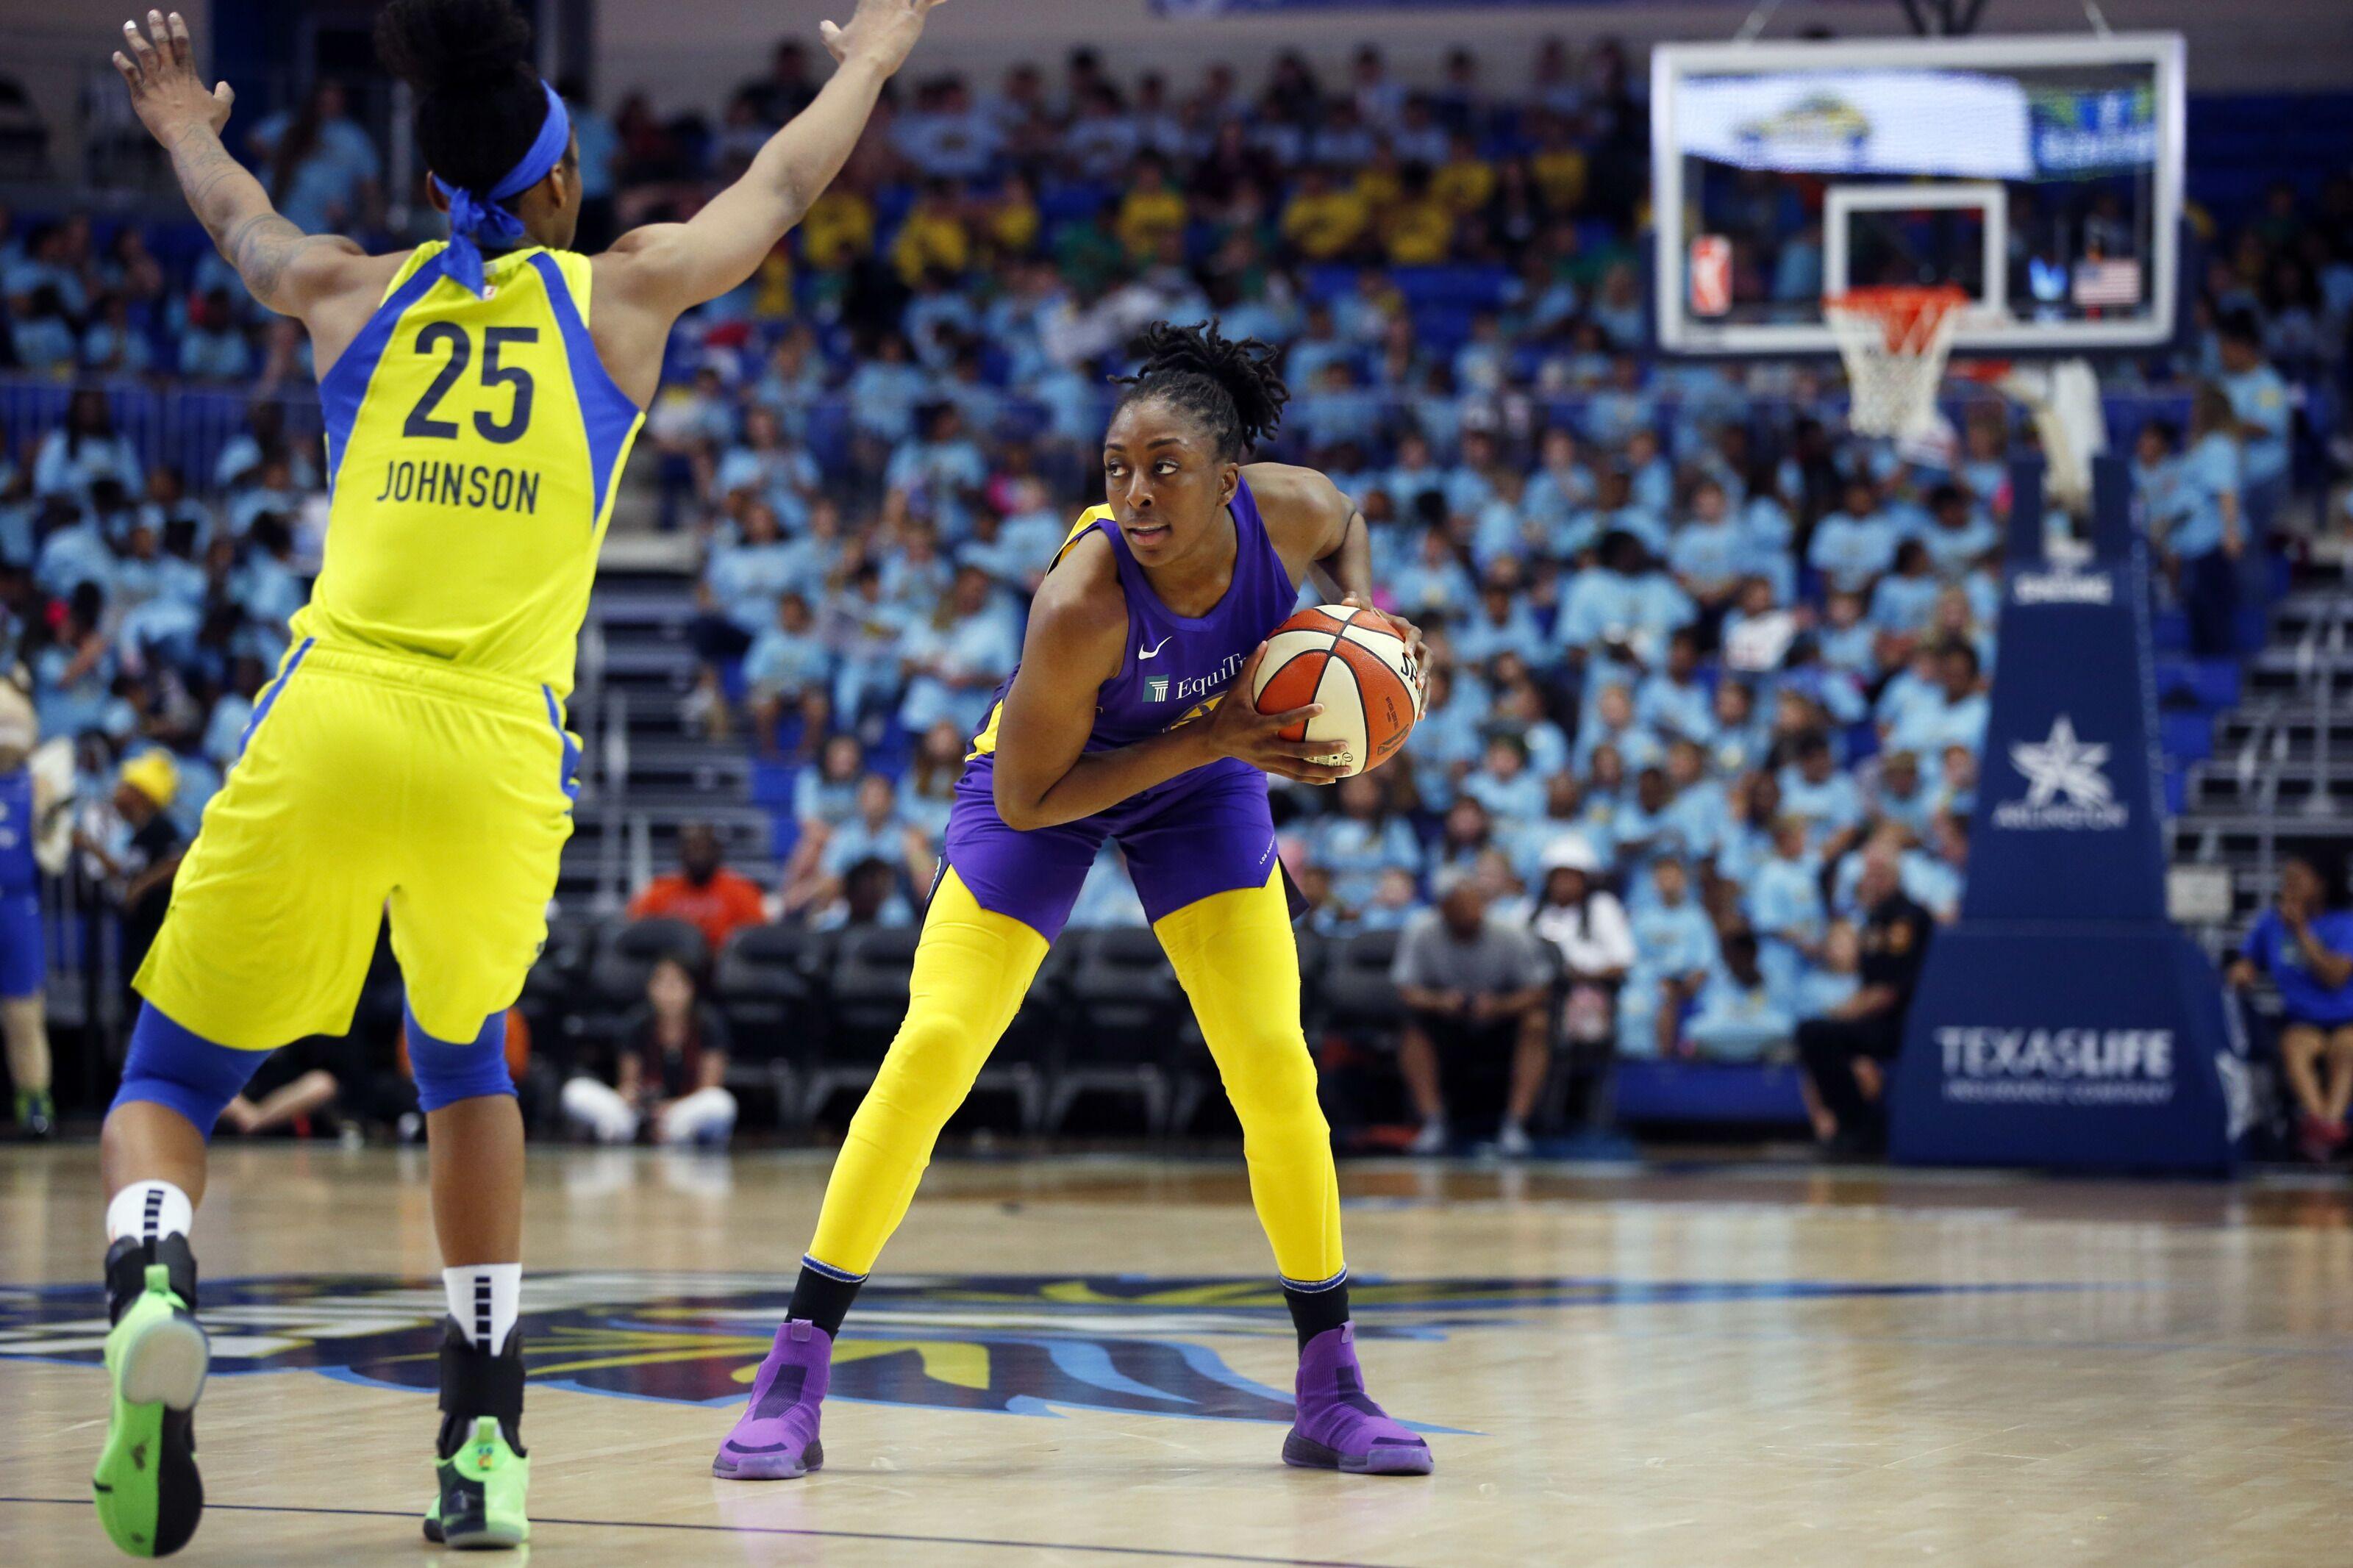 Jones and Ogwumike named WNBA Players of the Week